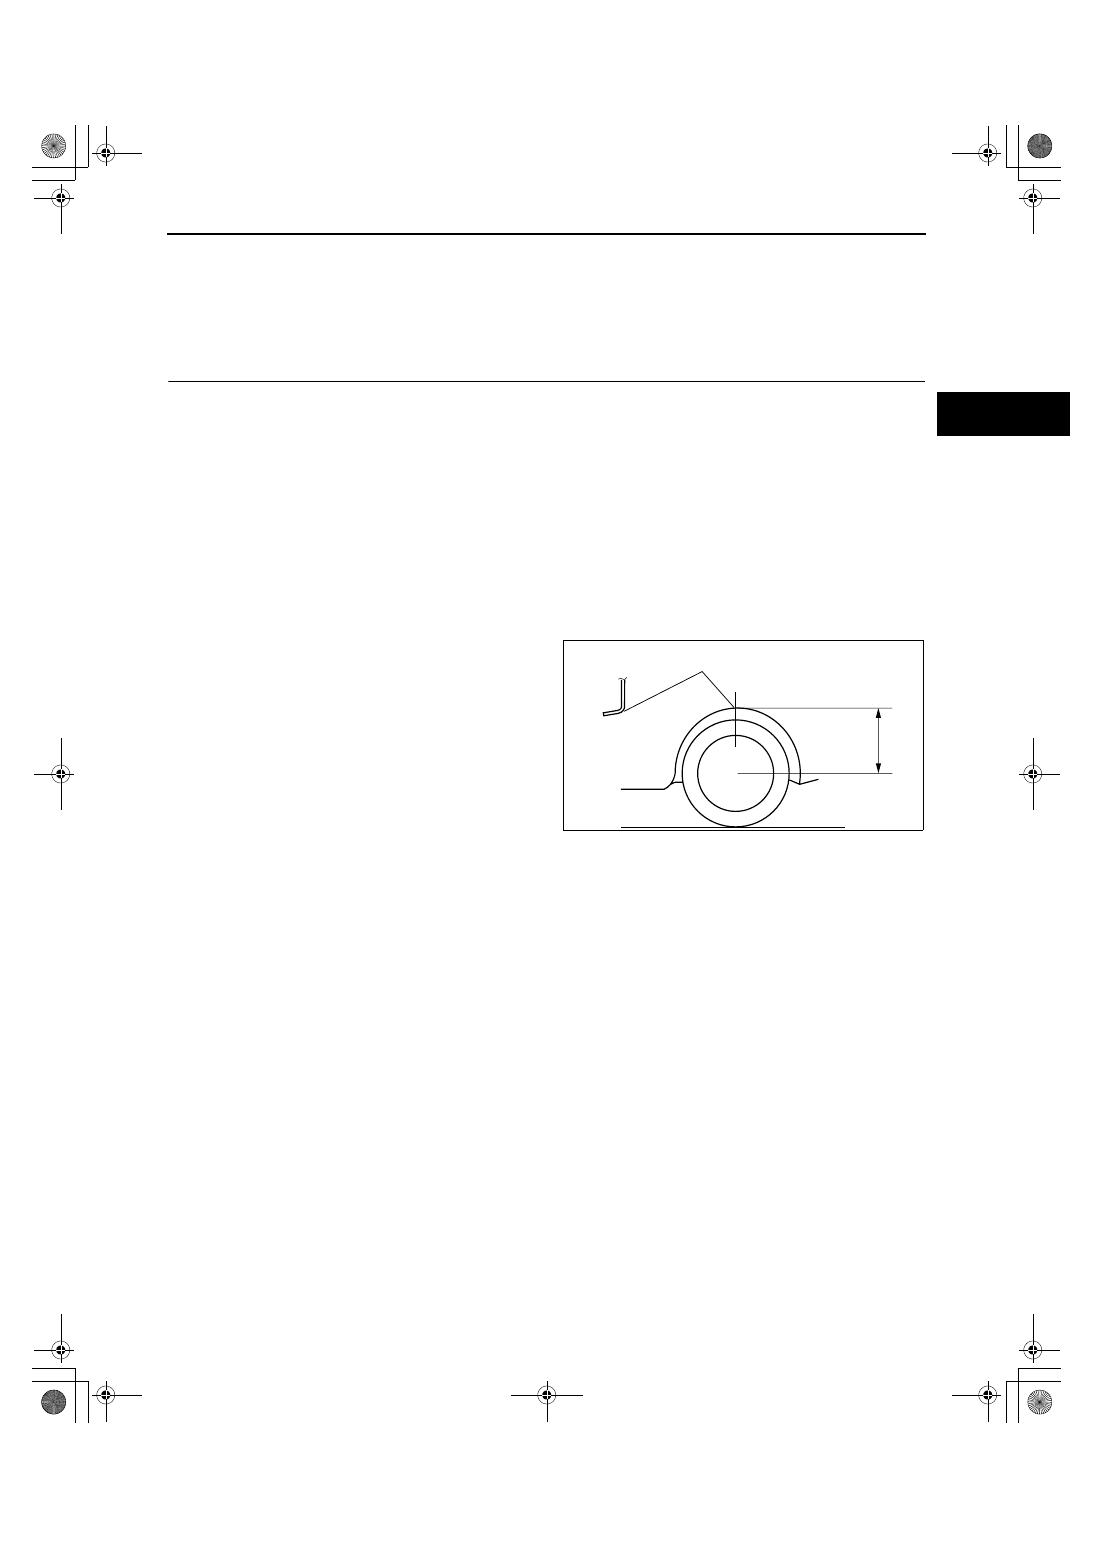 Mazda 3 Service Manual: Wheel Hub, Steering Knuckle RemovalInstallation